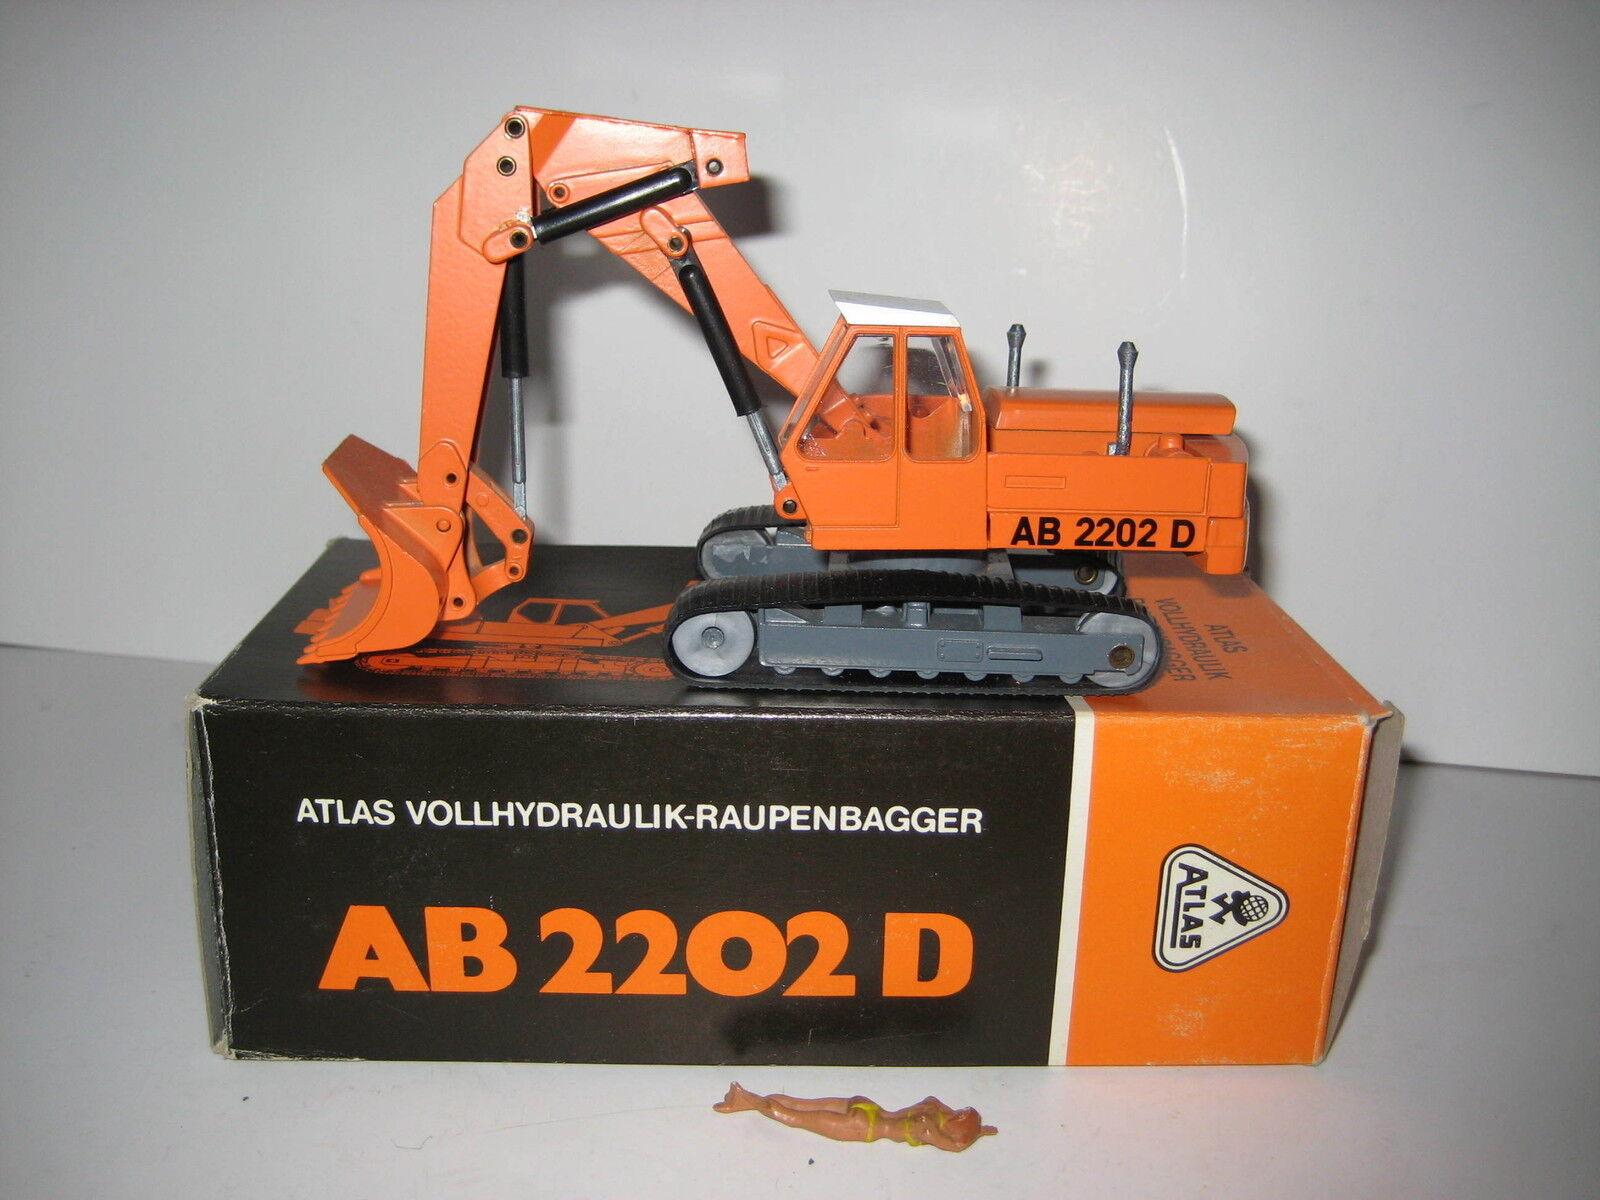 ATLAS AB 2202 D BAGGER HOCHLÖFFEL  145.3 NZG 1 50 OVP